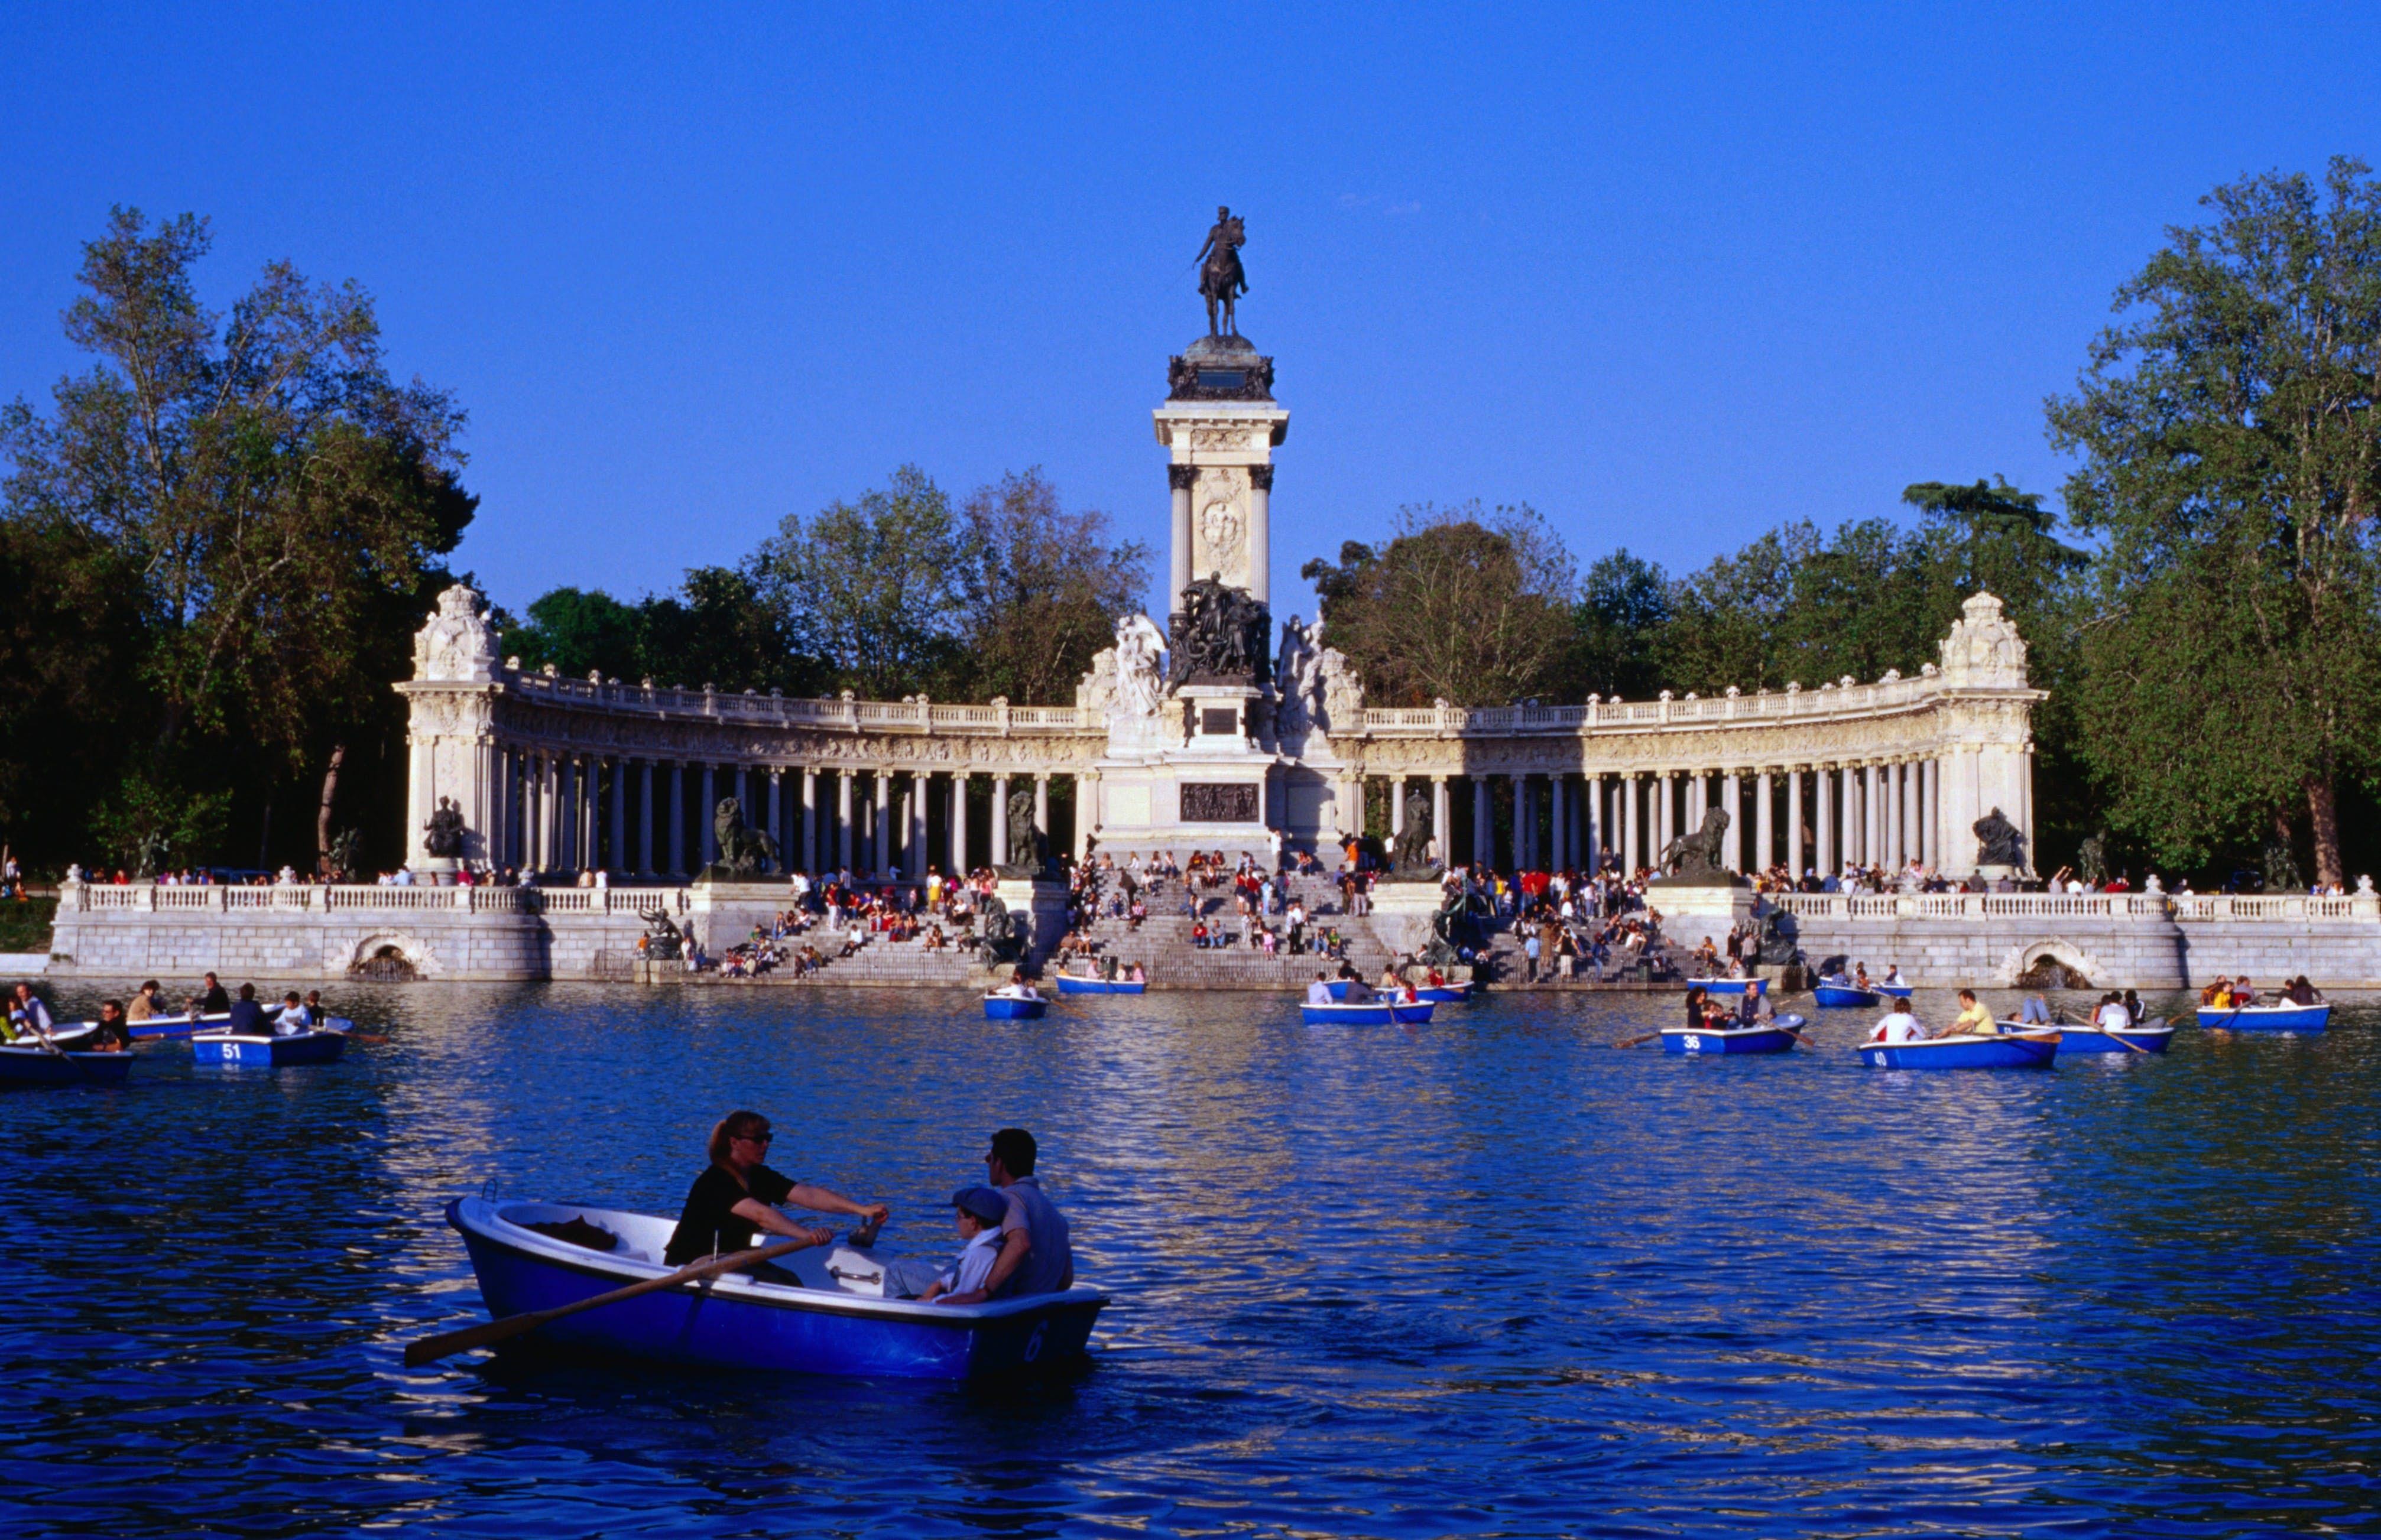 Parque del Buen Retiro   Madrid, Spain Attractions - Lonely Planet